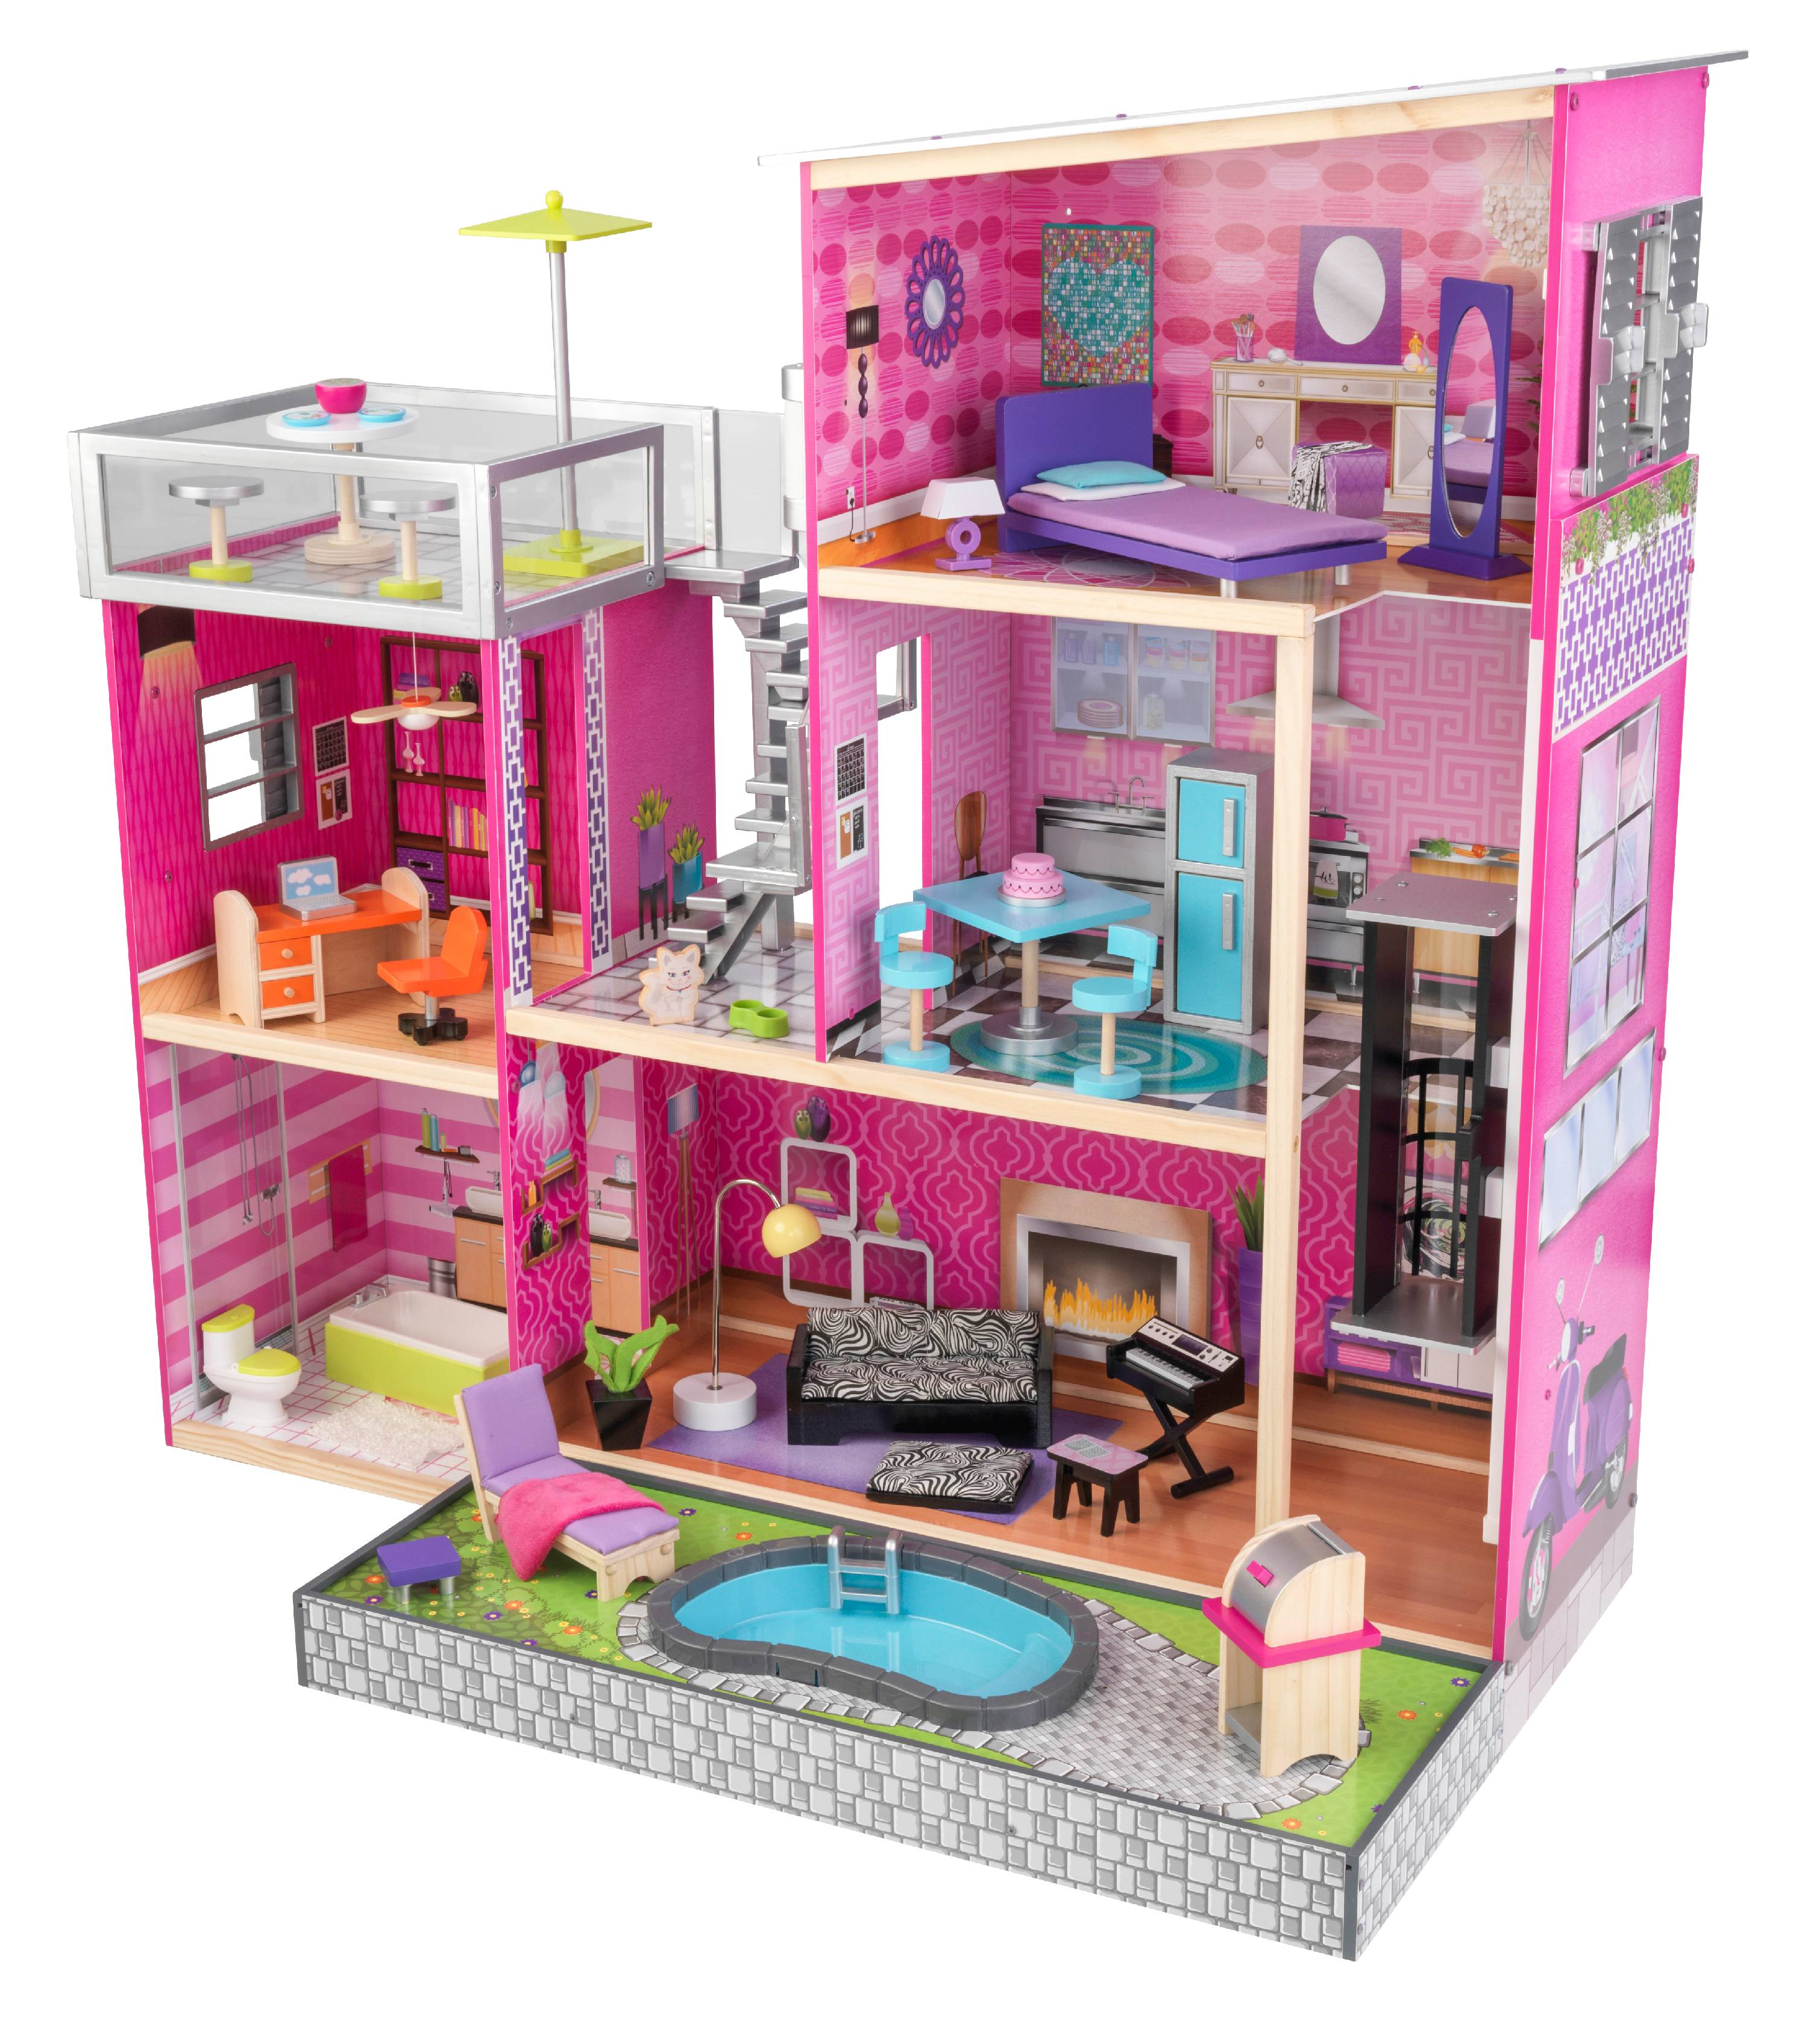 Kidkraft uptown dollhouse with 36 accessories ebay for Lit kidkraft